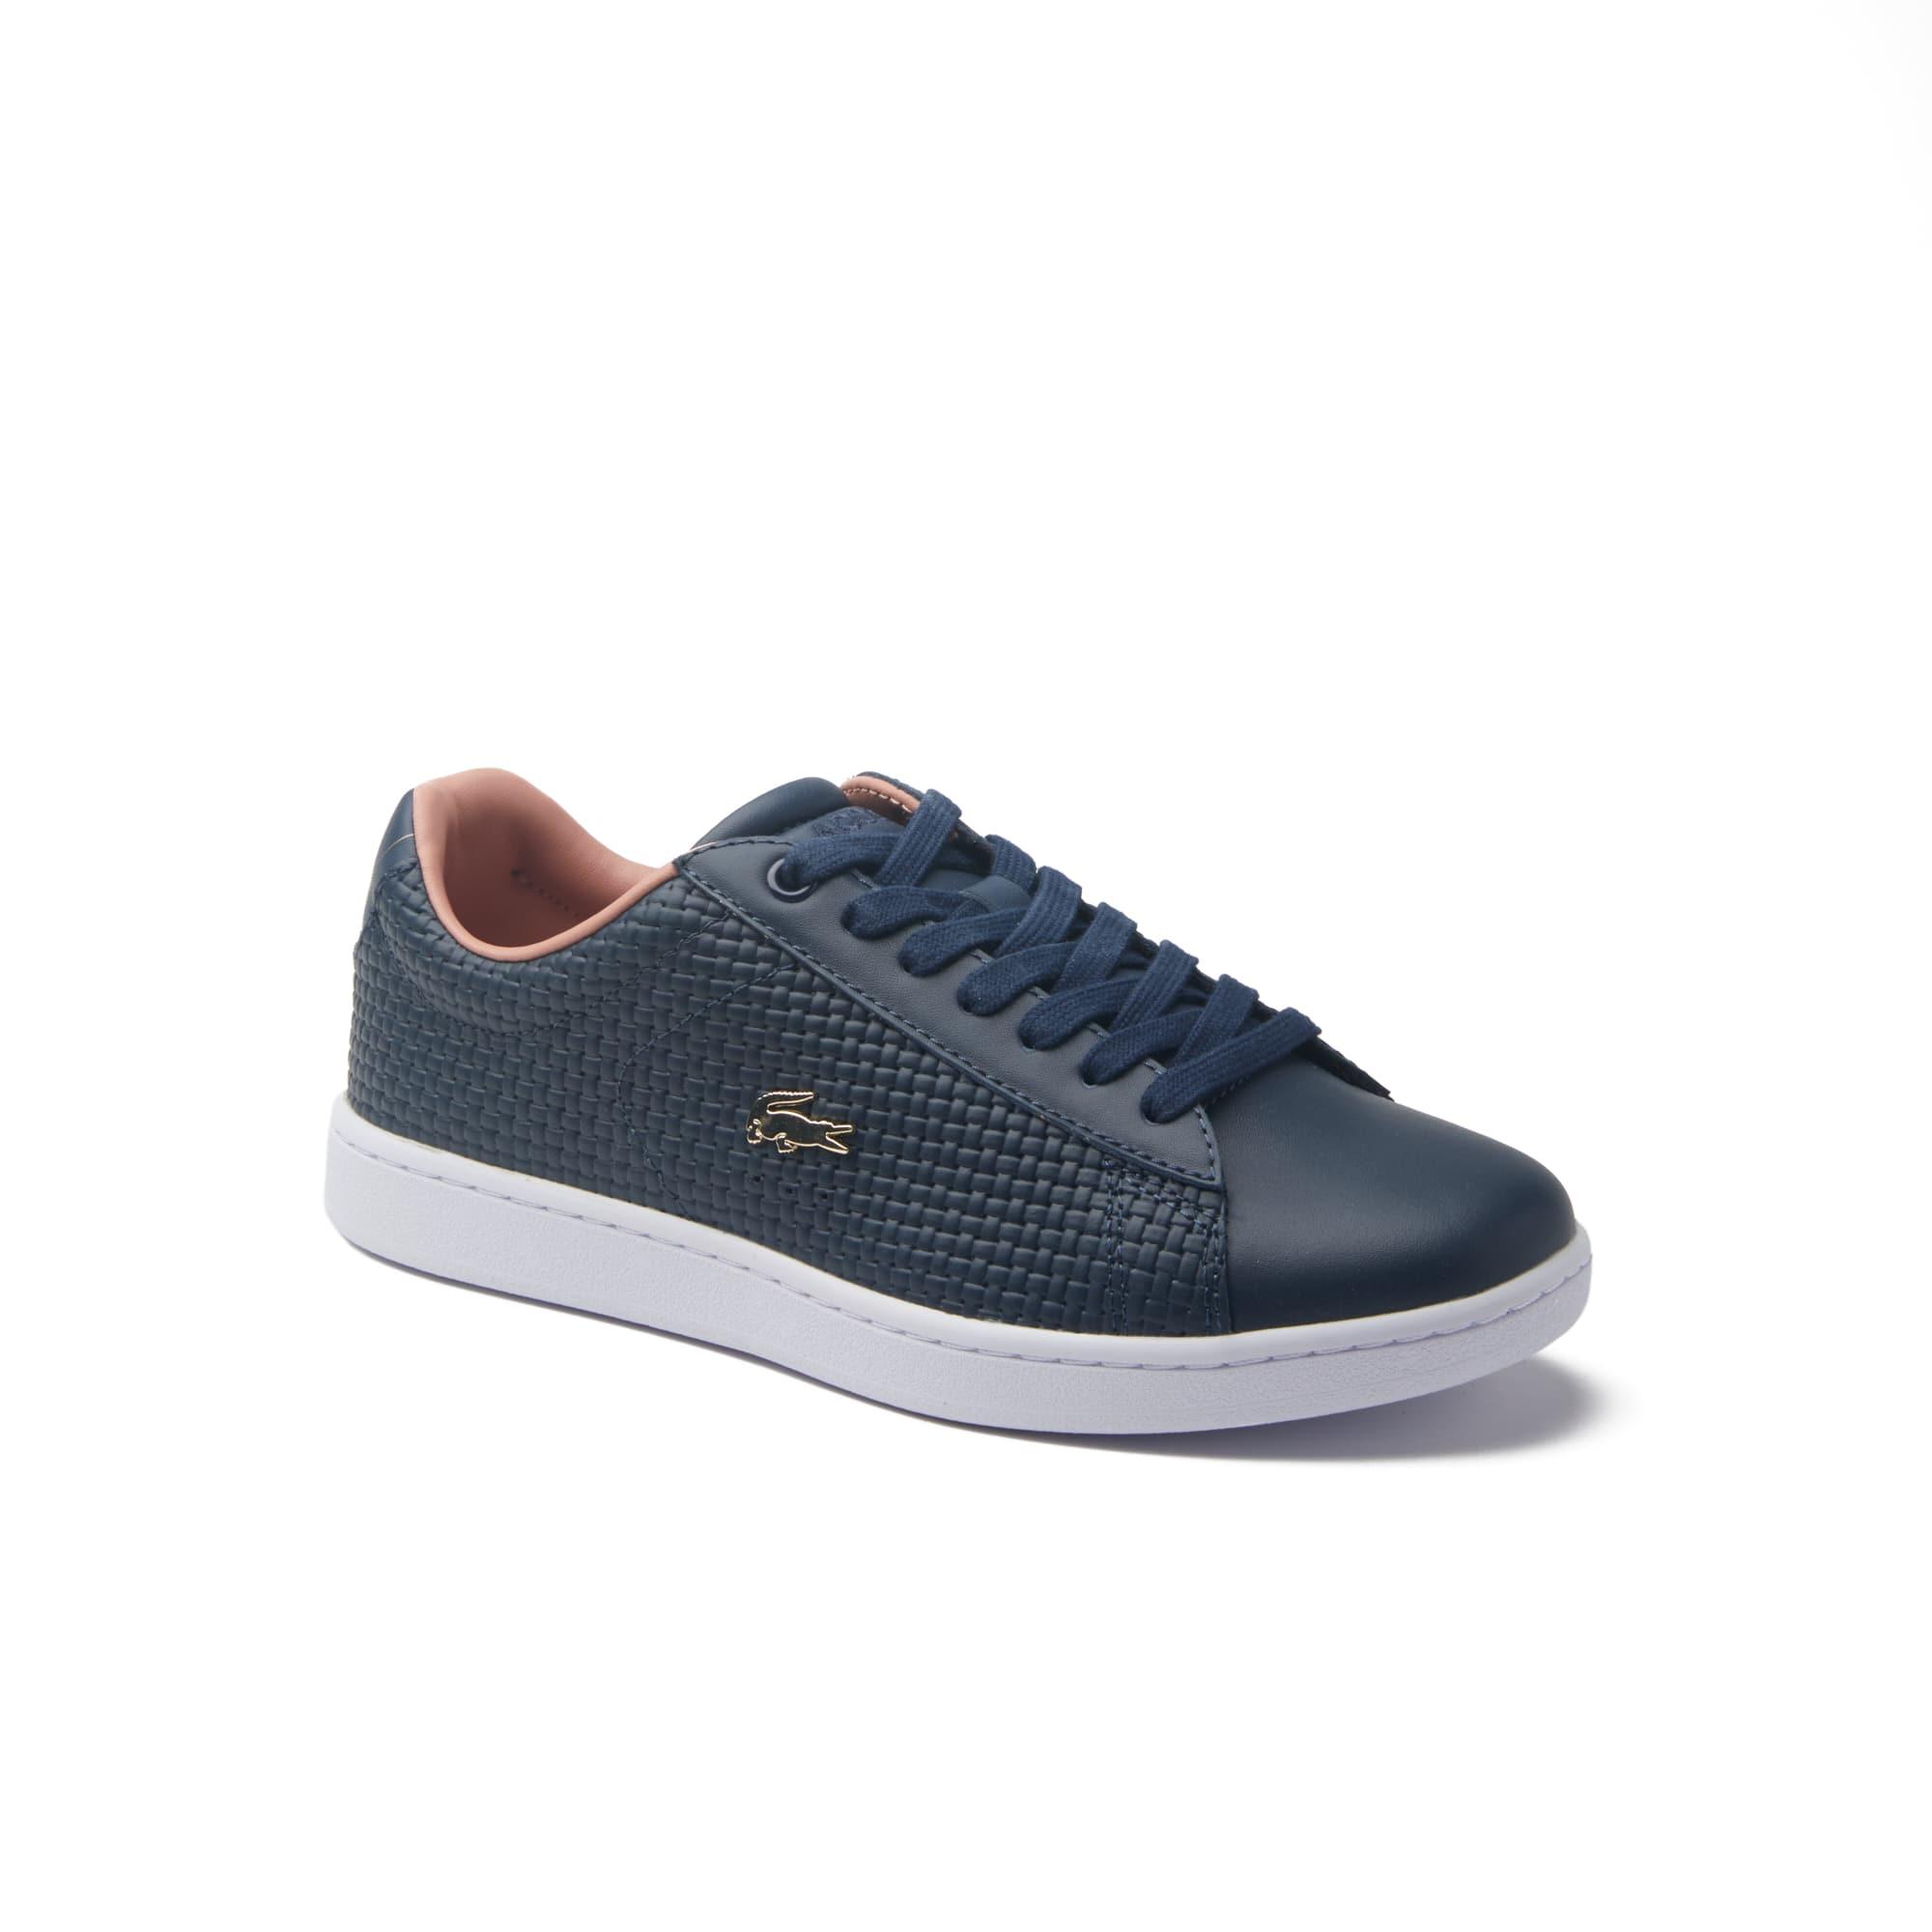 Sneakers Carnaby Evo en cuir tressé